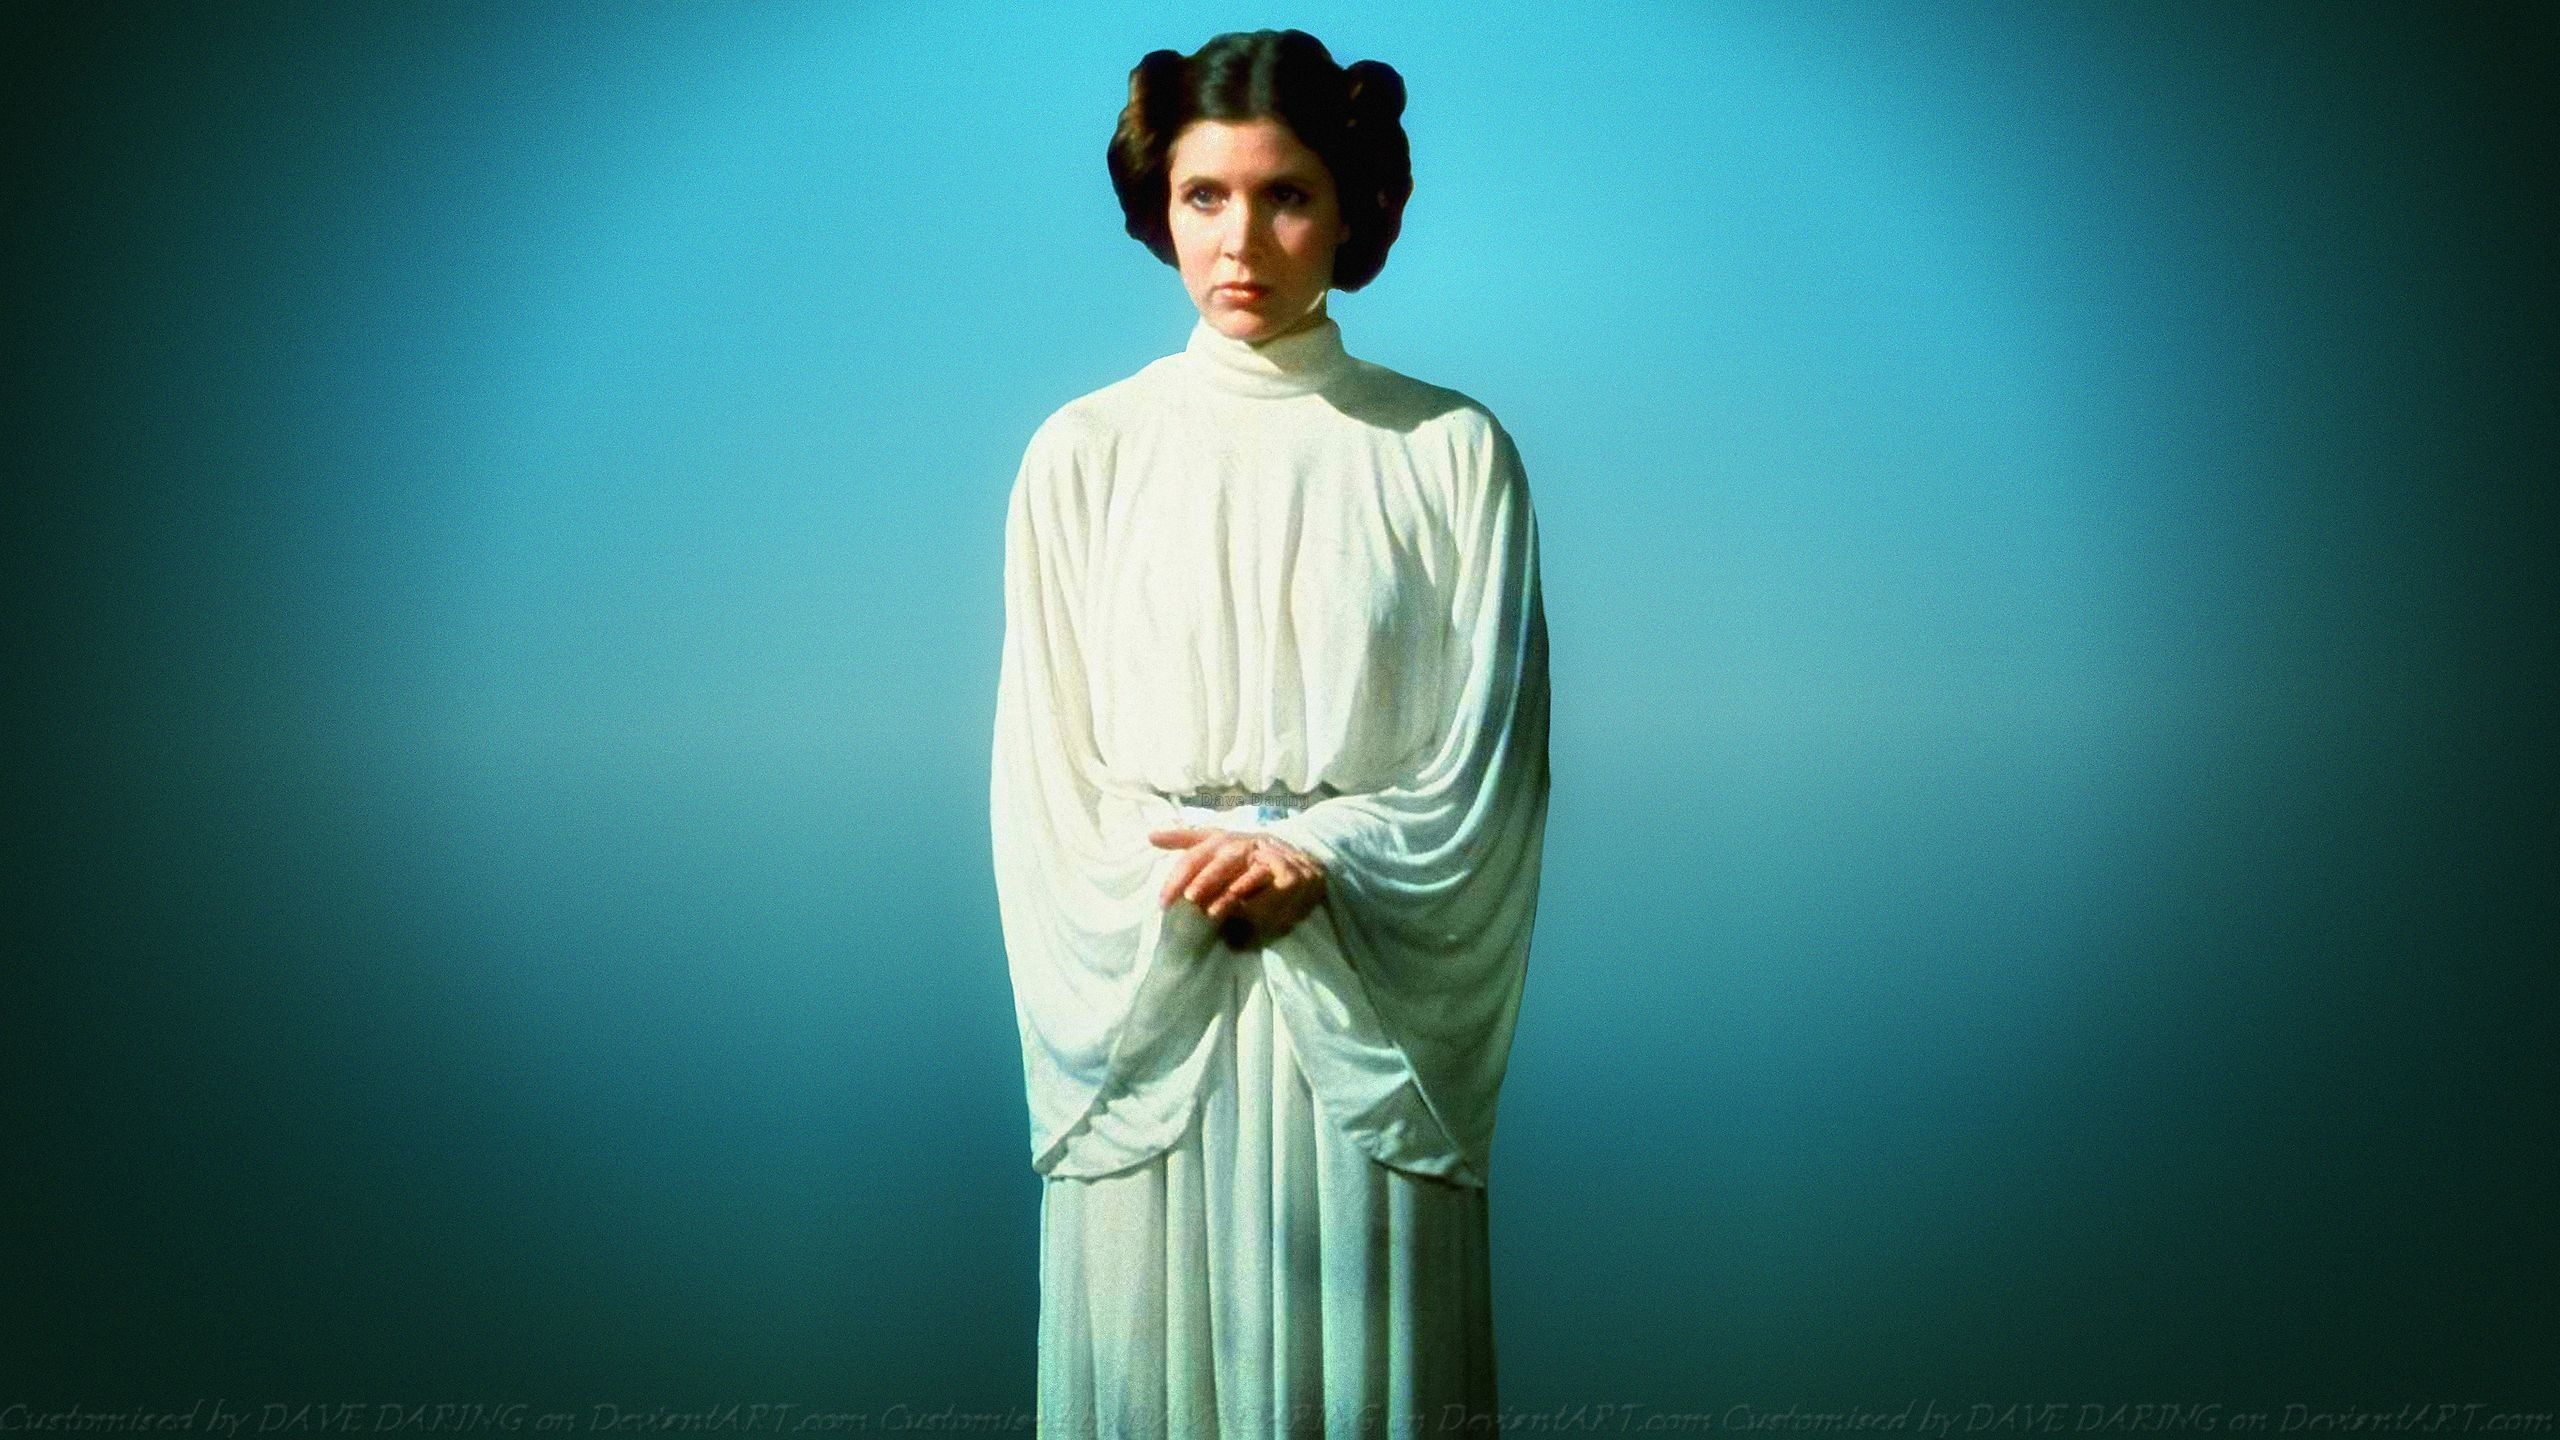 Princess Leia Wallpapers Top Free Princess Leia Backgrounds Wallpaperaccess